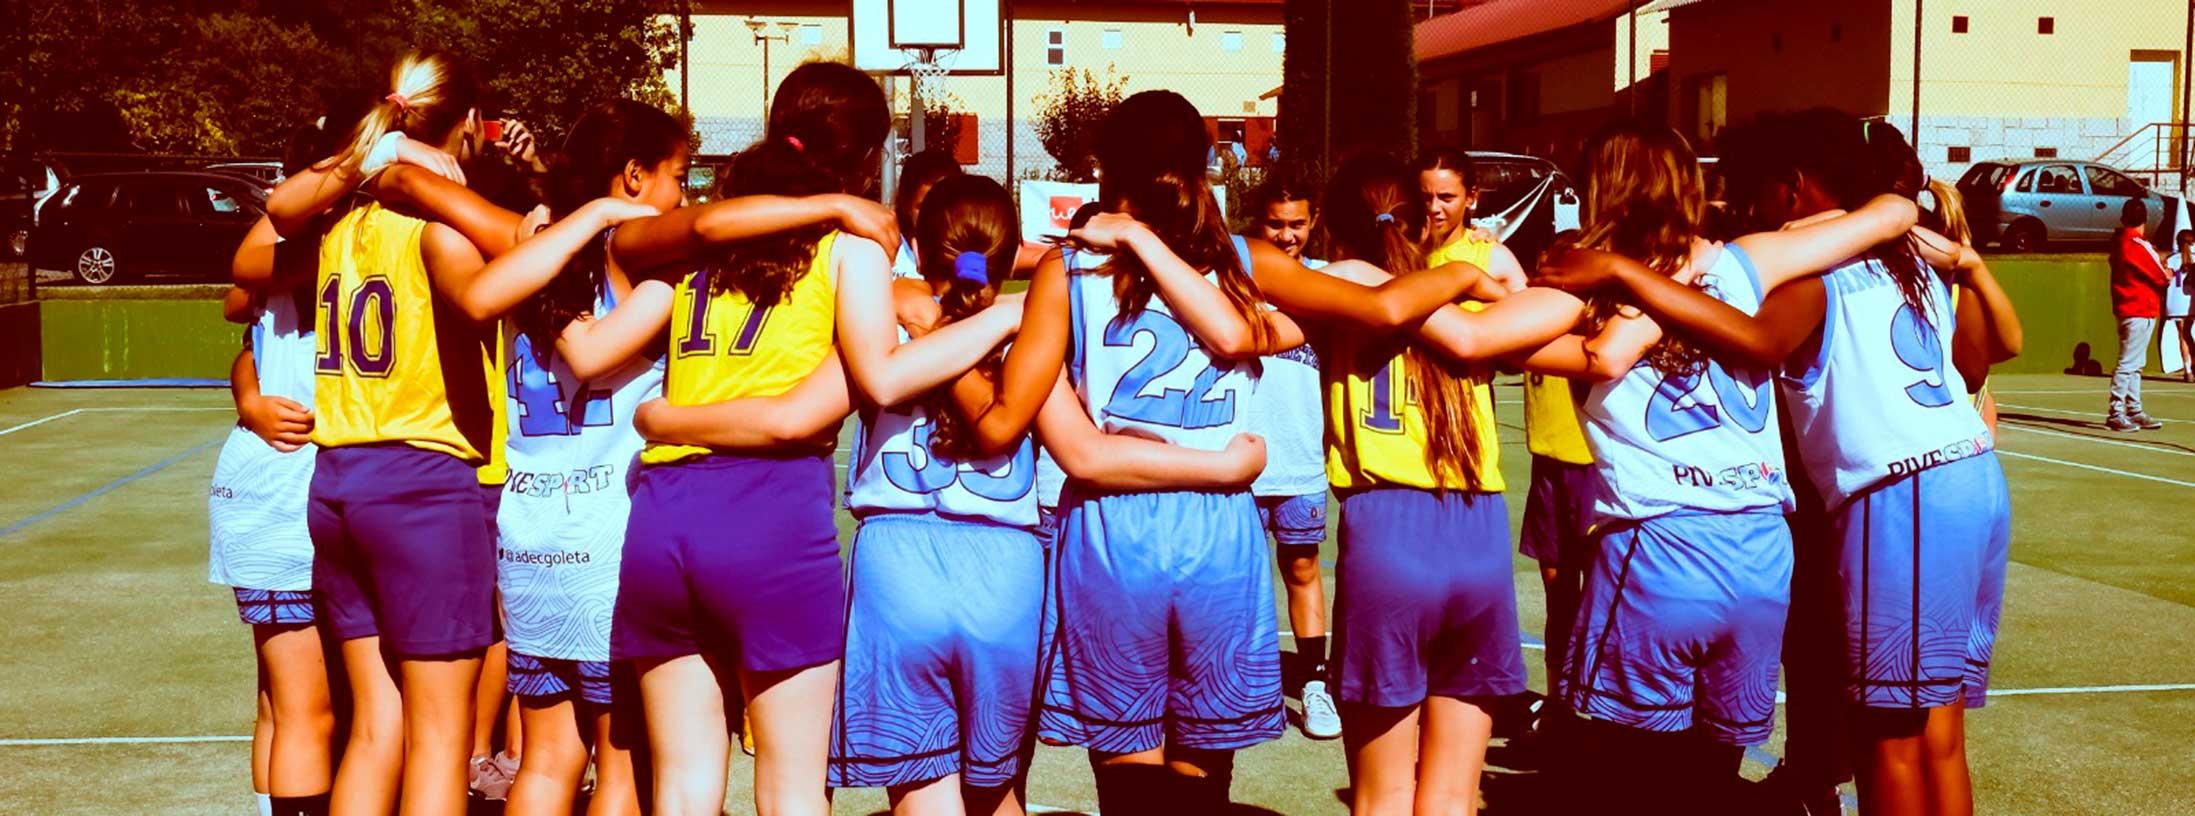 jugadoras de baloncesto abrazadas